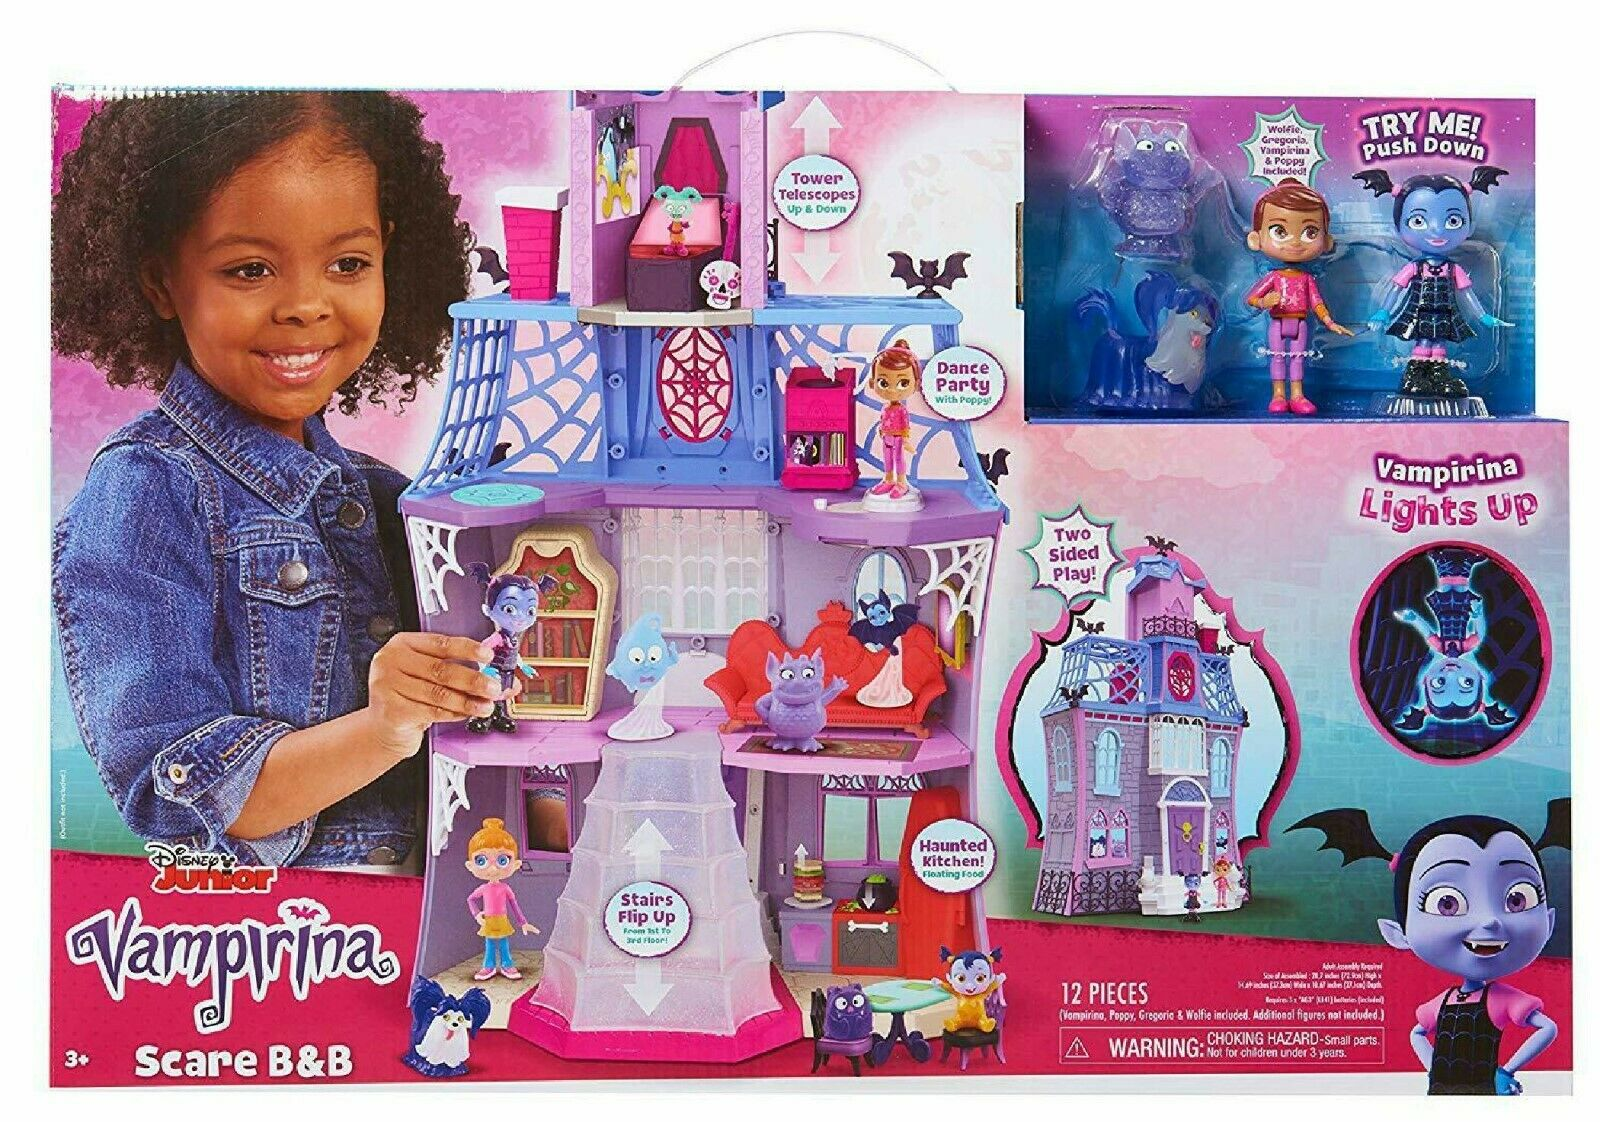 Vampirina Scare 3 Floor B&B Doll House Vampirina LightsUp Poppy Gregoria Wolfie